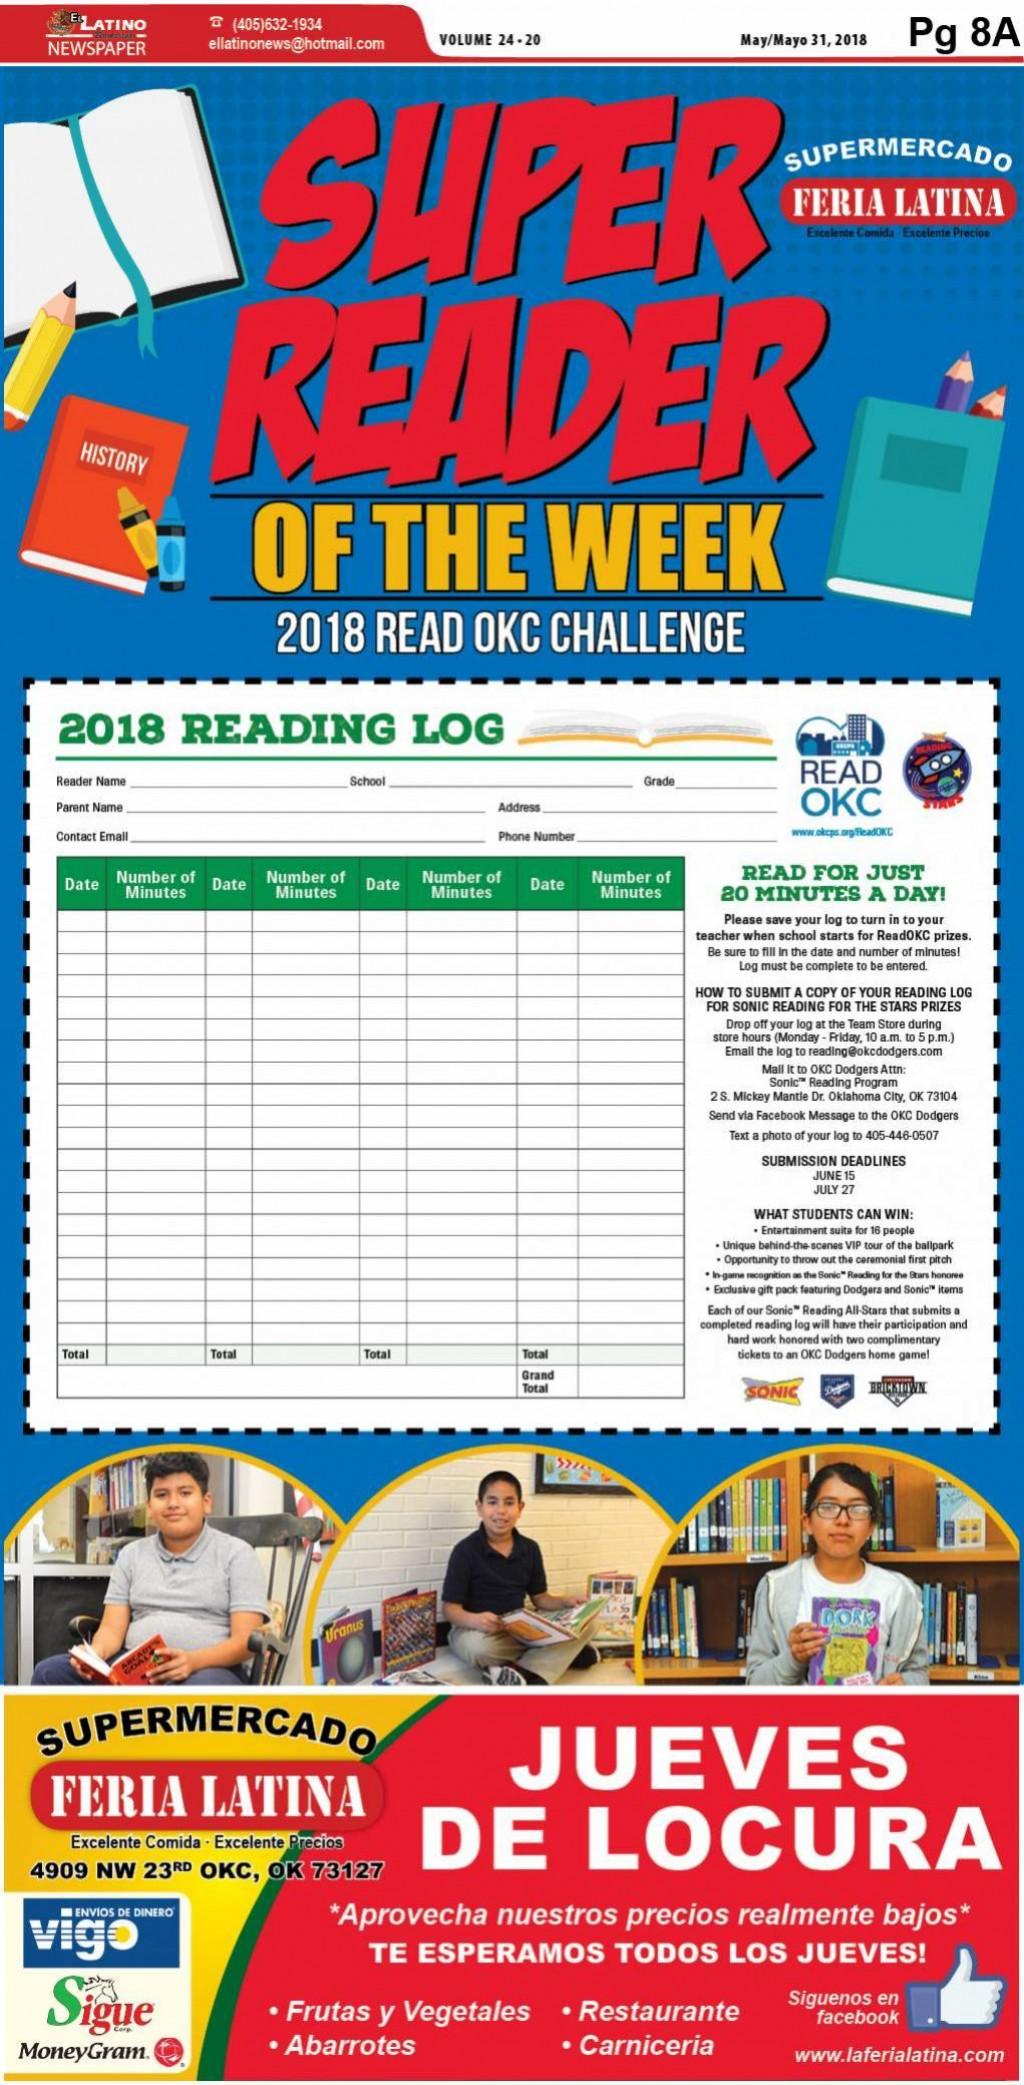 Super Reader of the Week: 2018 Read OKC Challenge